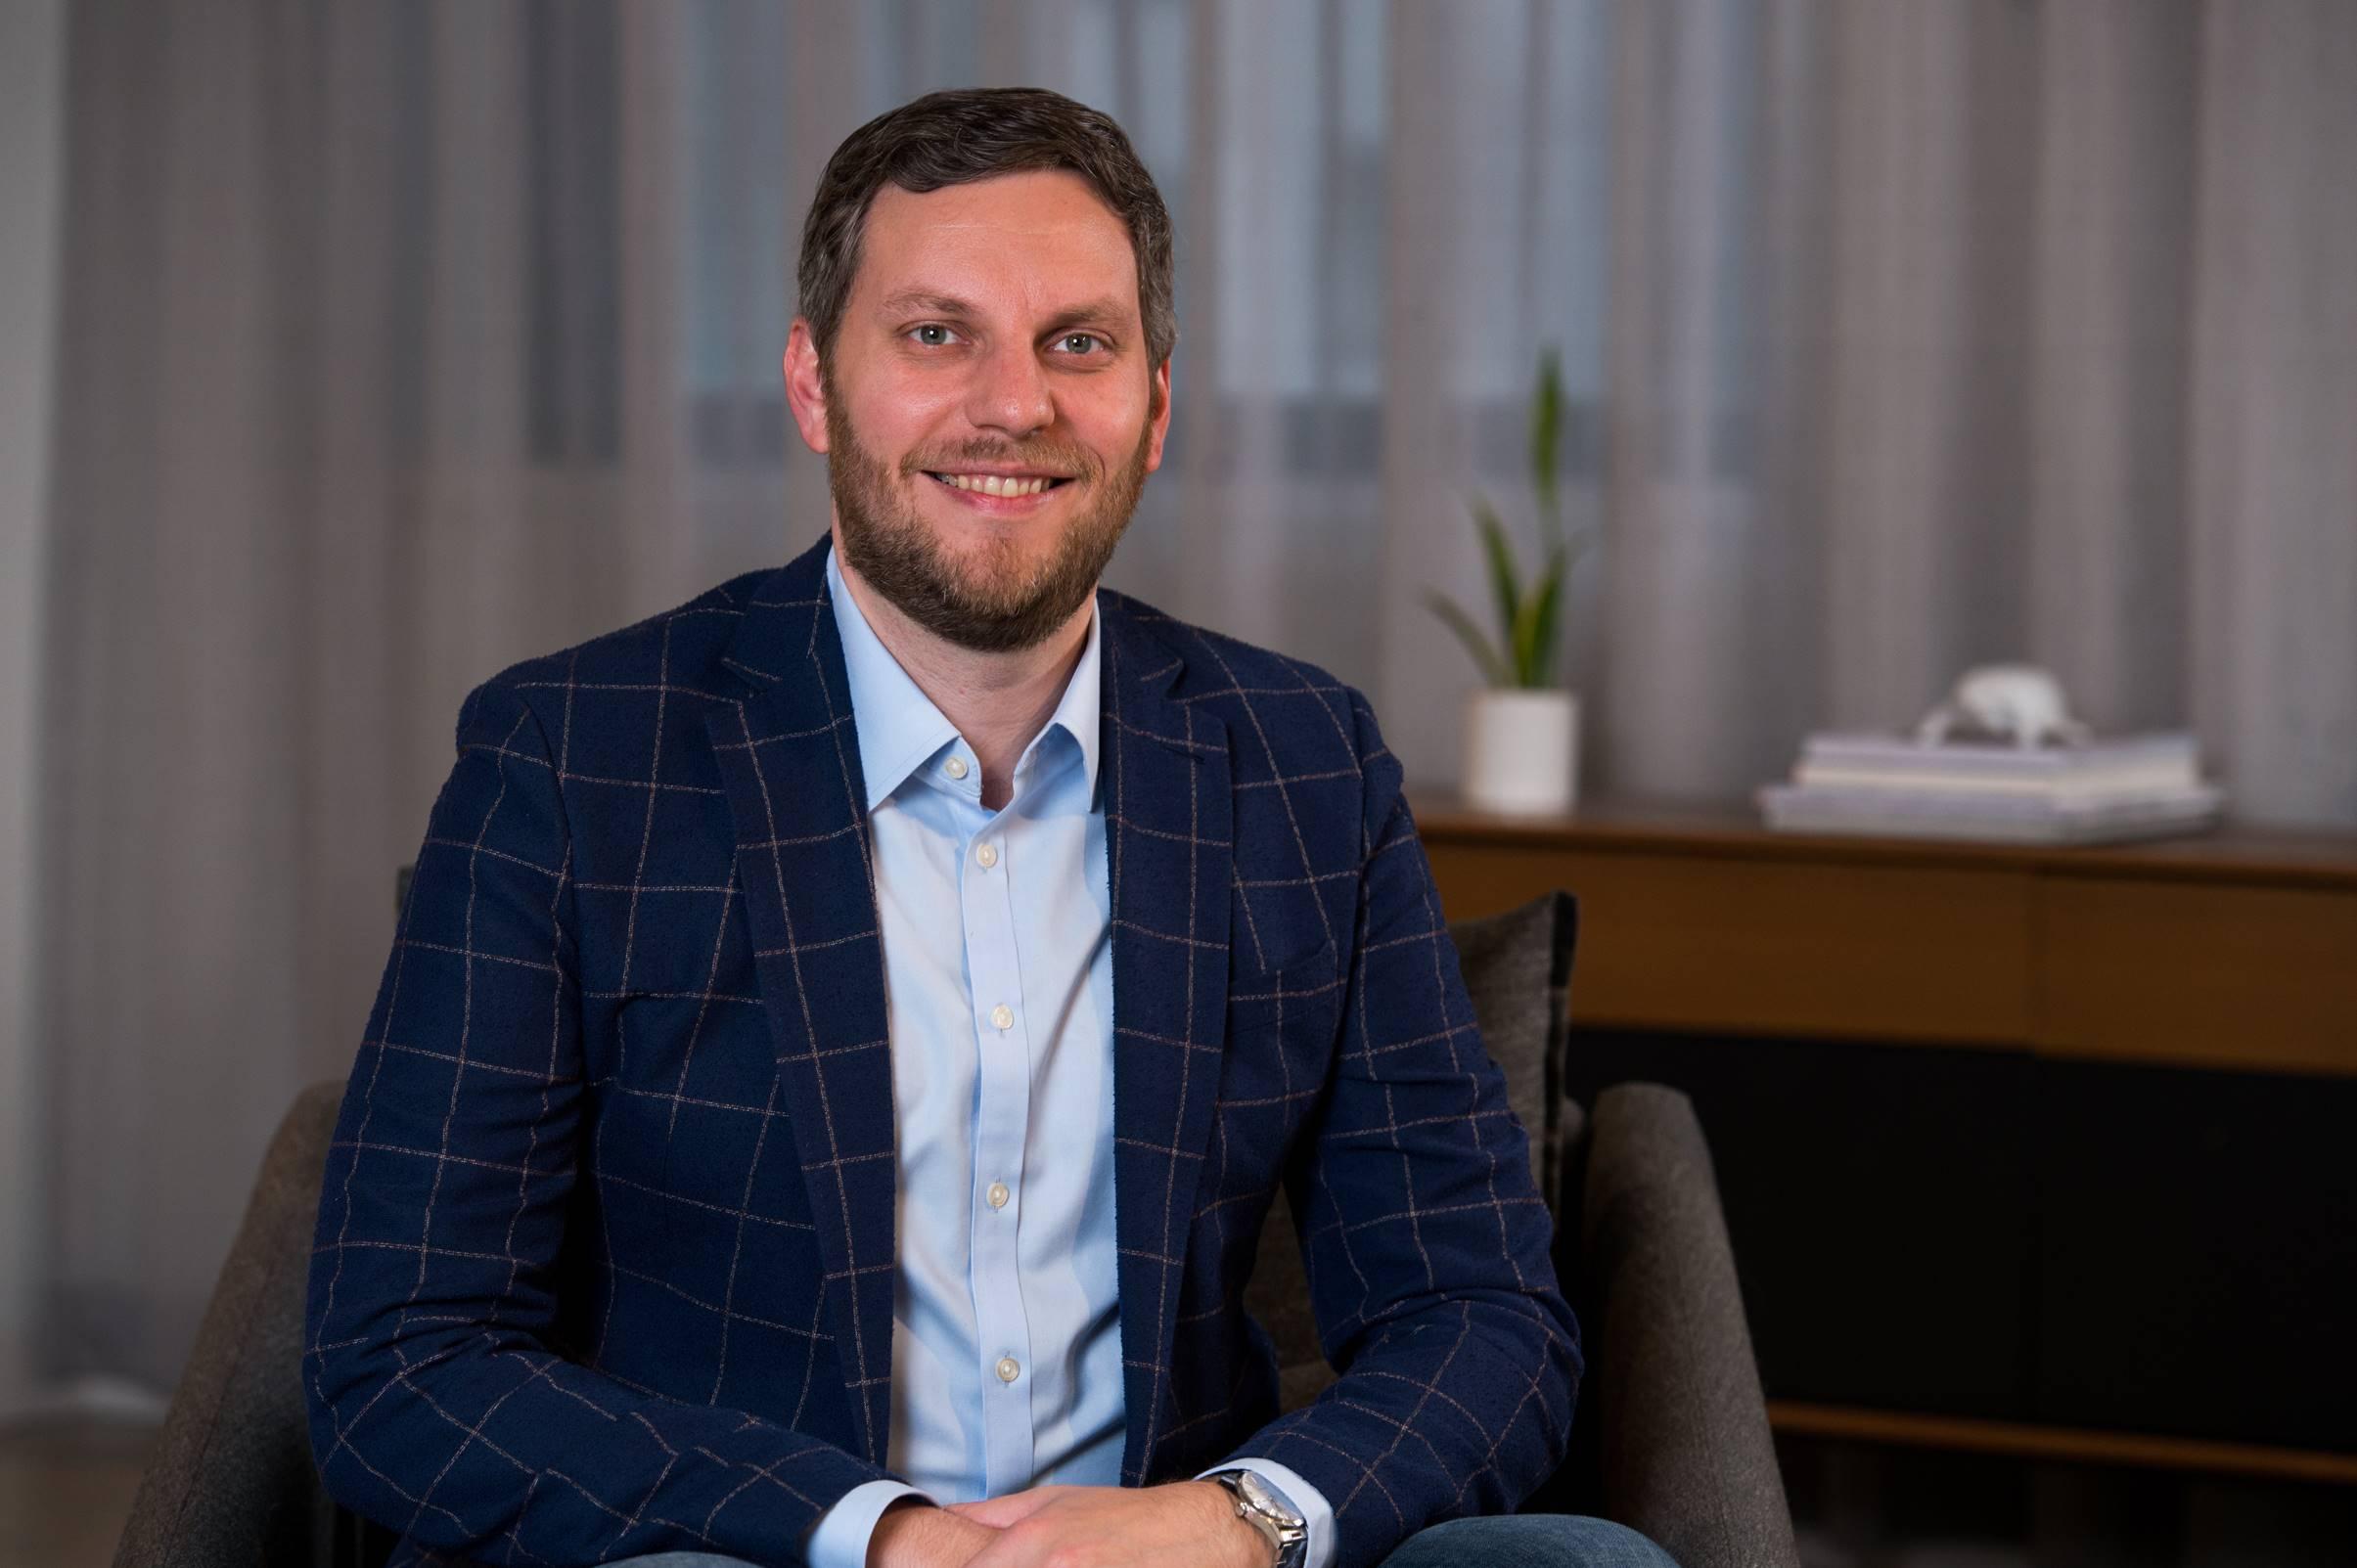 Chris Iconos, Vice President & Global Energy Practice Lead, Axiom